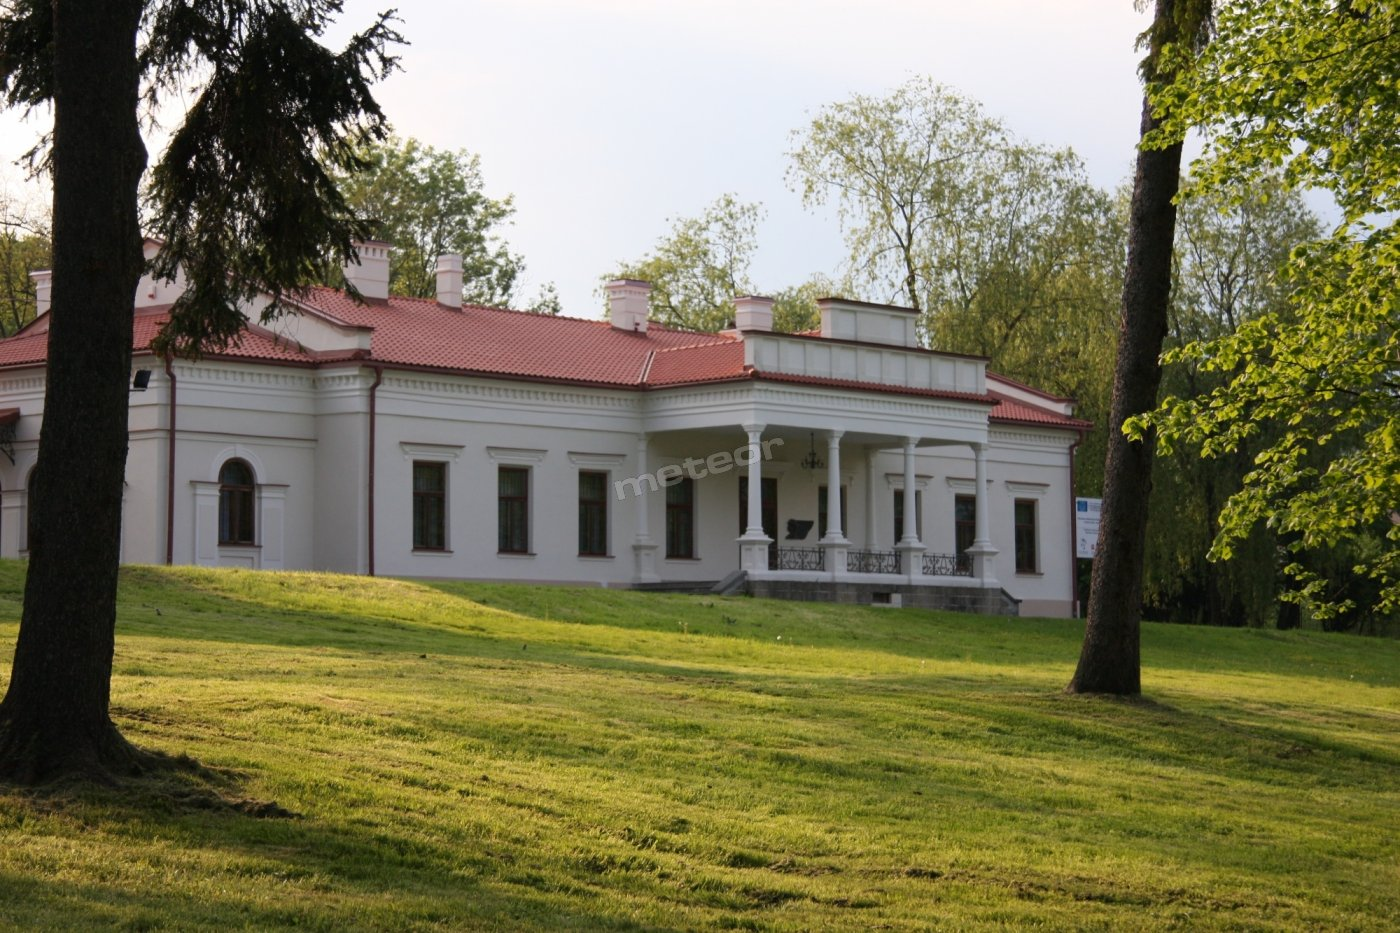 Noclegi w Kompleksie Dworsko-Parkowym